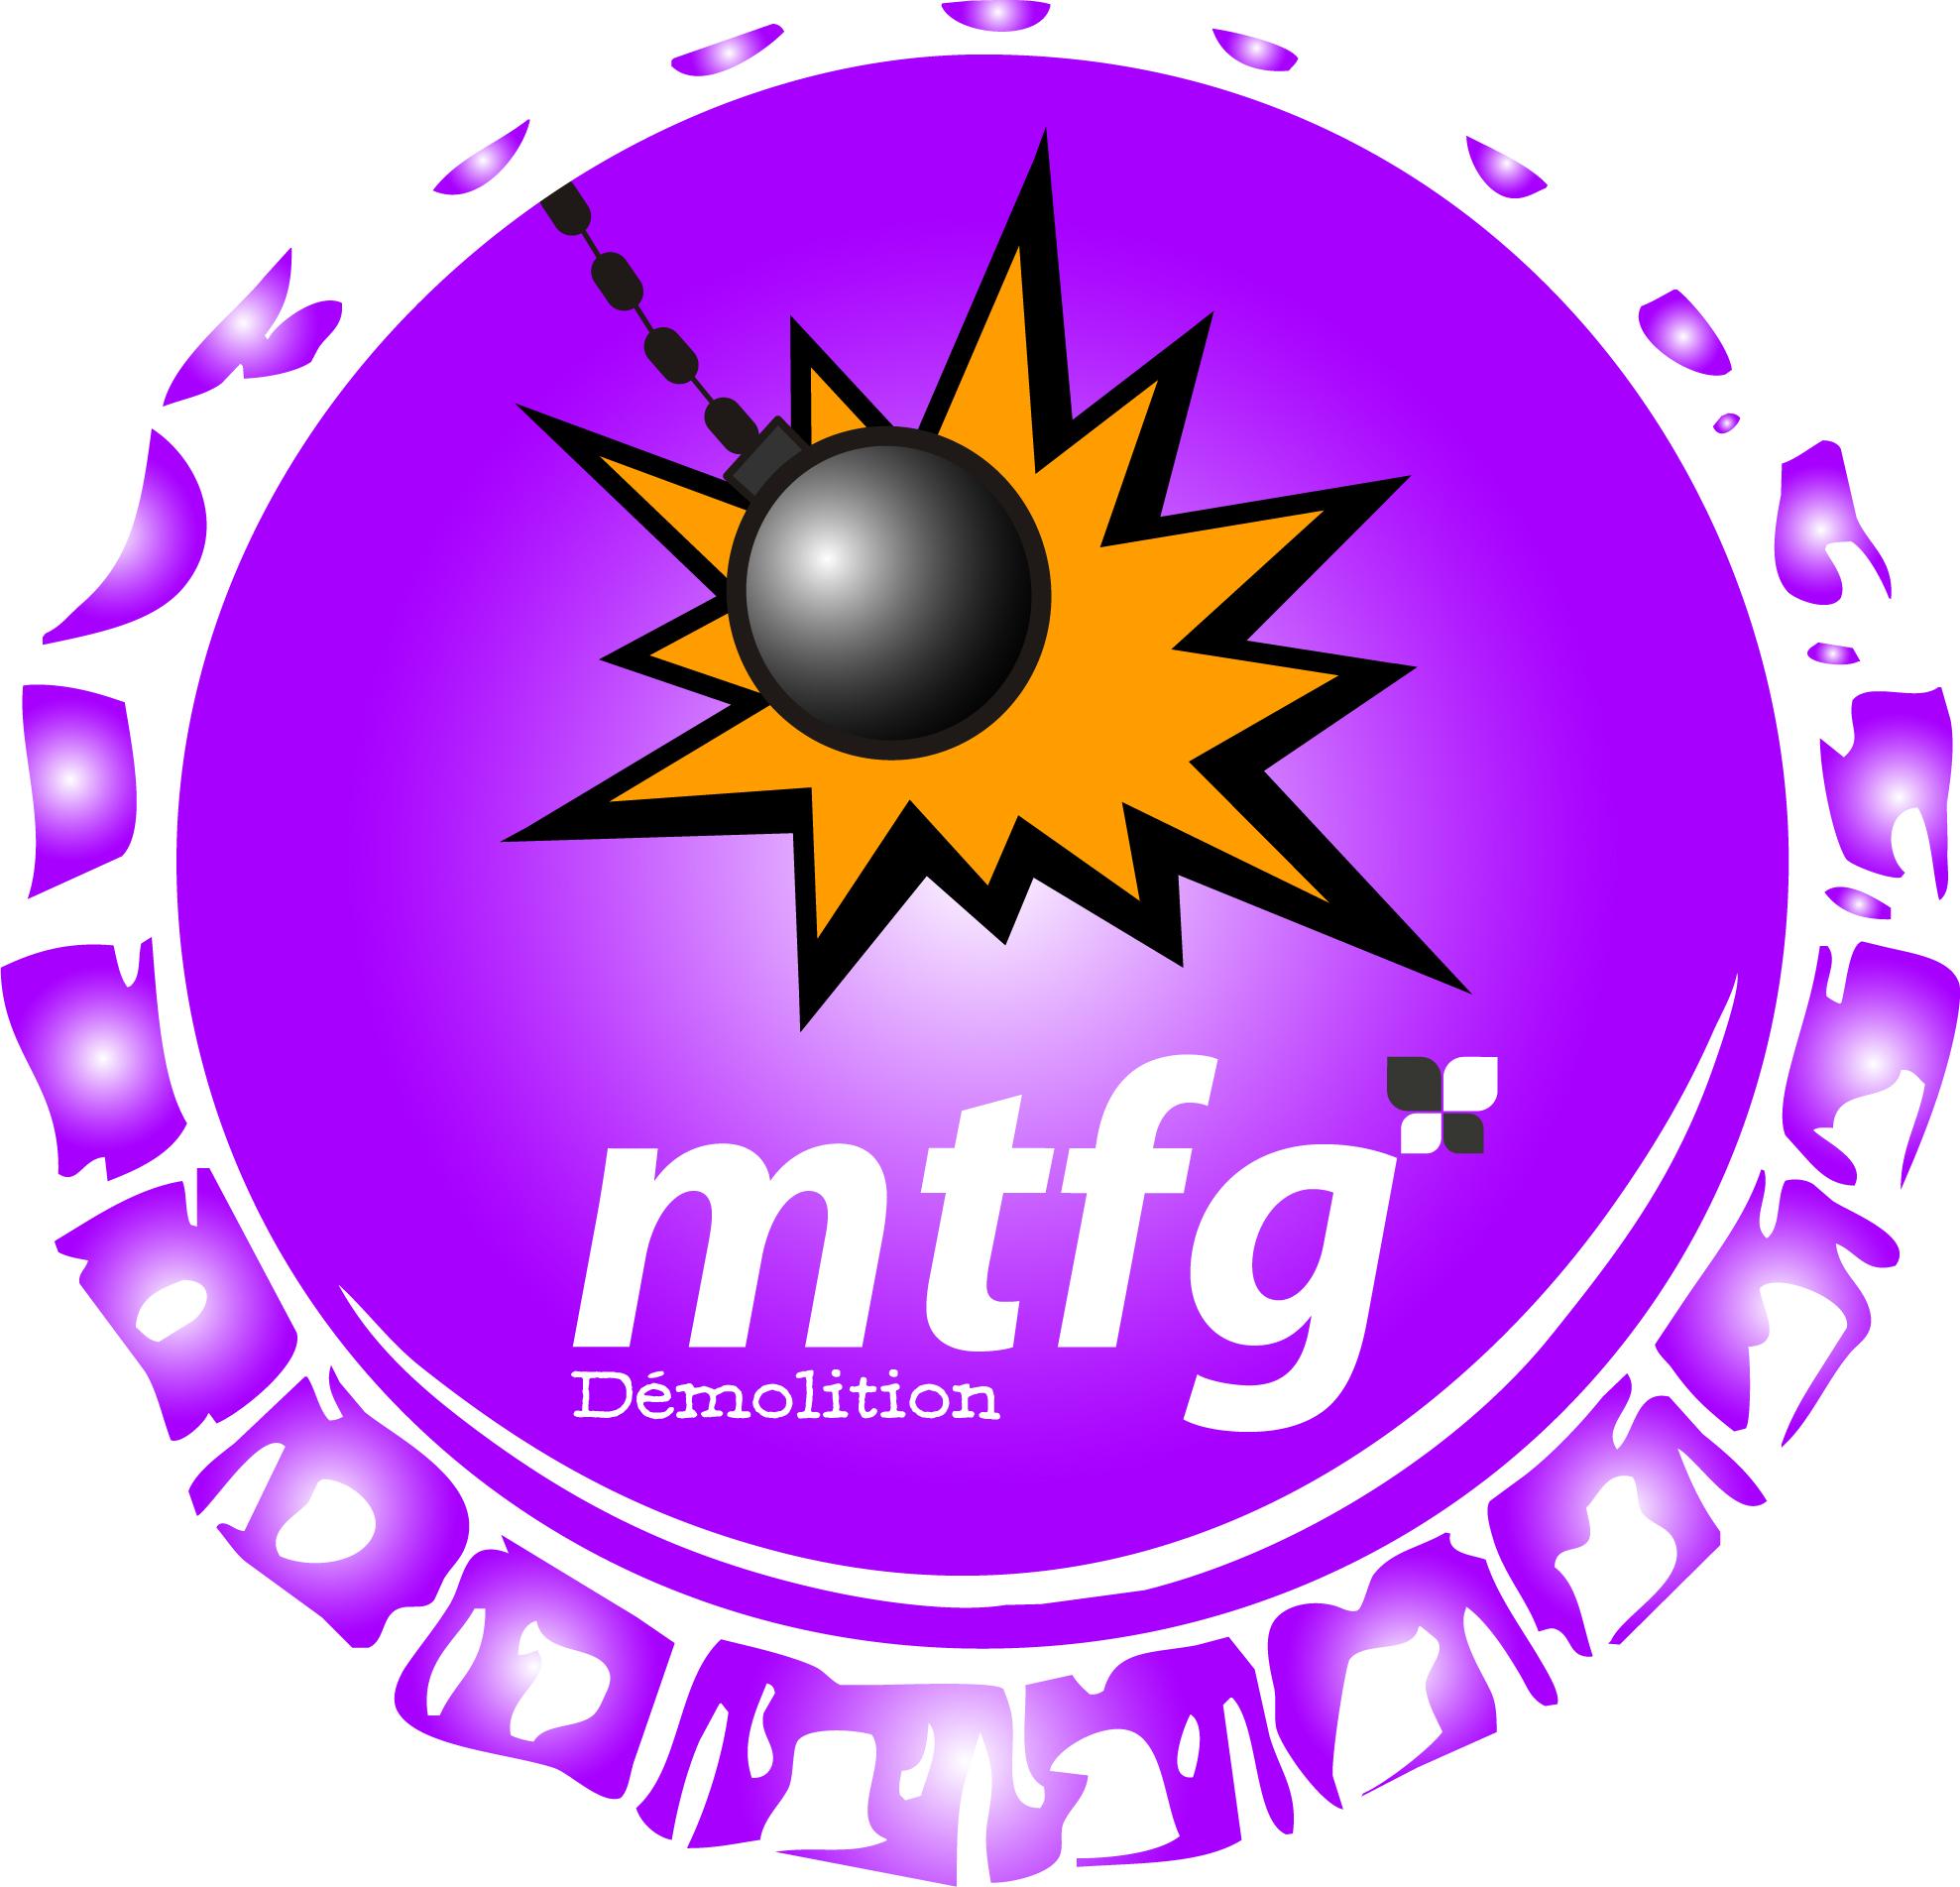 MTFG Démolition